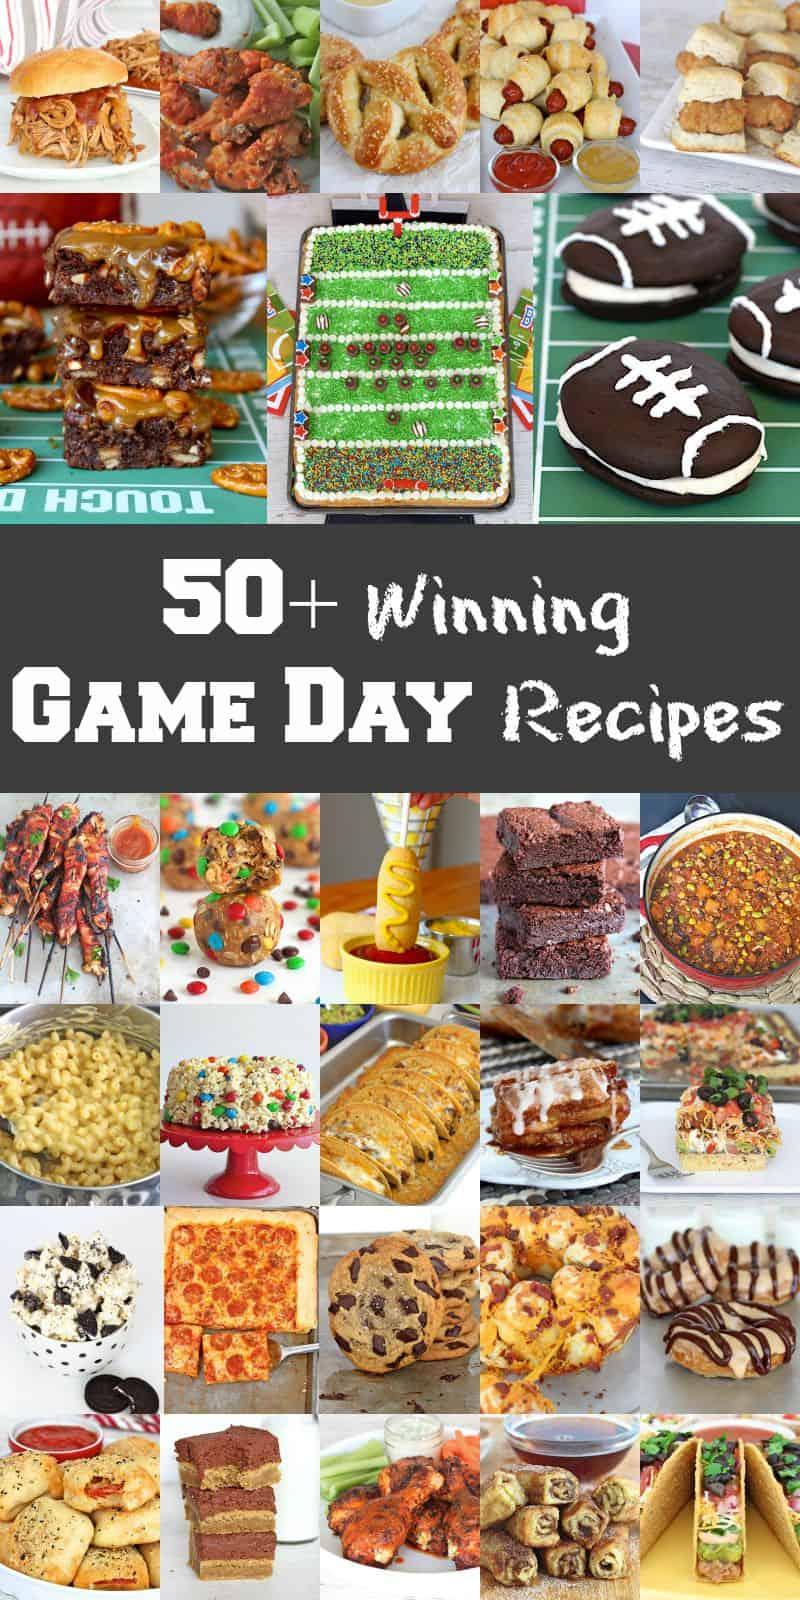 50+ Winning Game Day Recipes